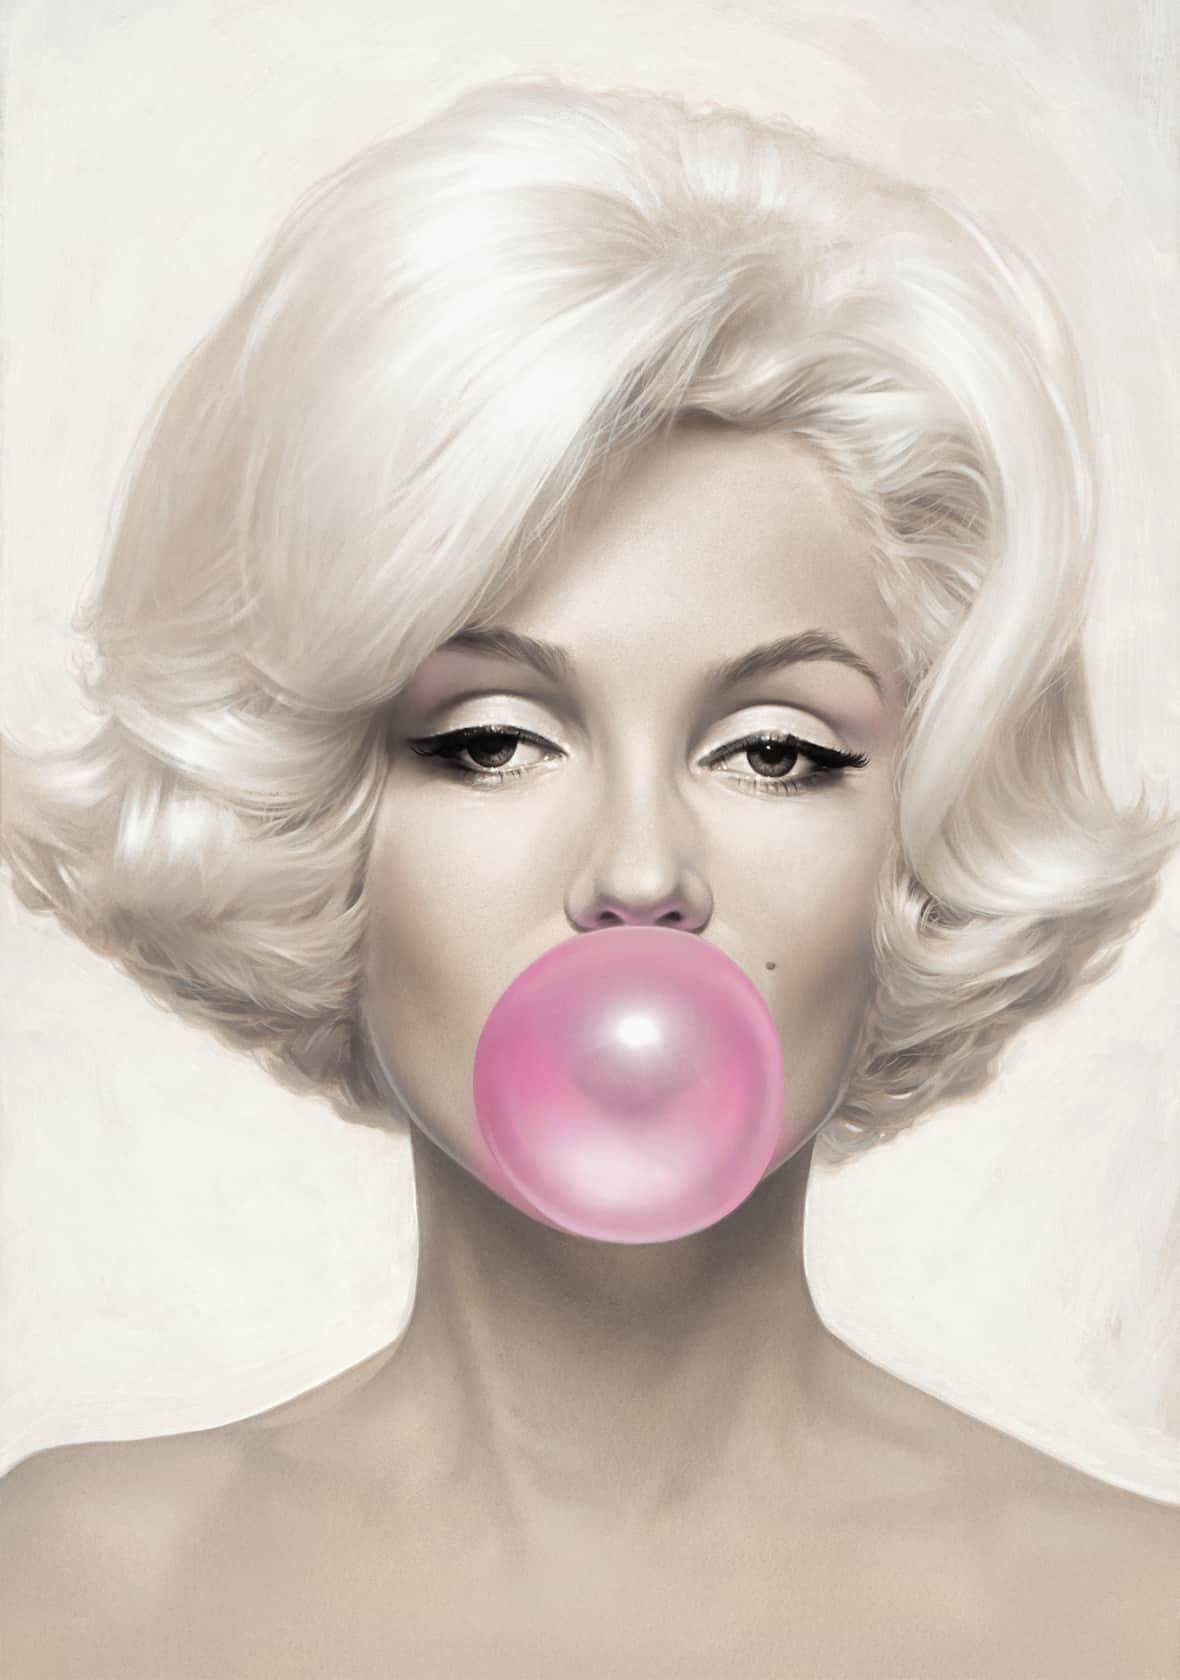 Michael Moebius, Marilyn Monroe Pink Bubblegum, 2015